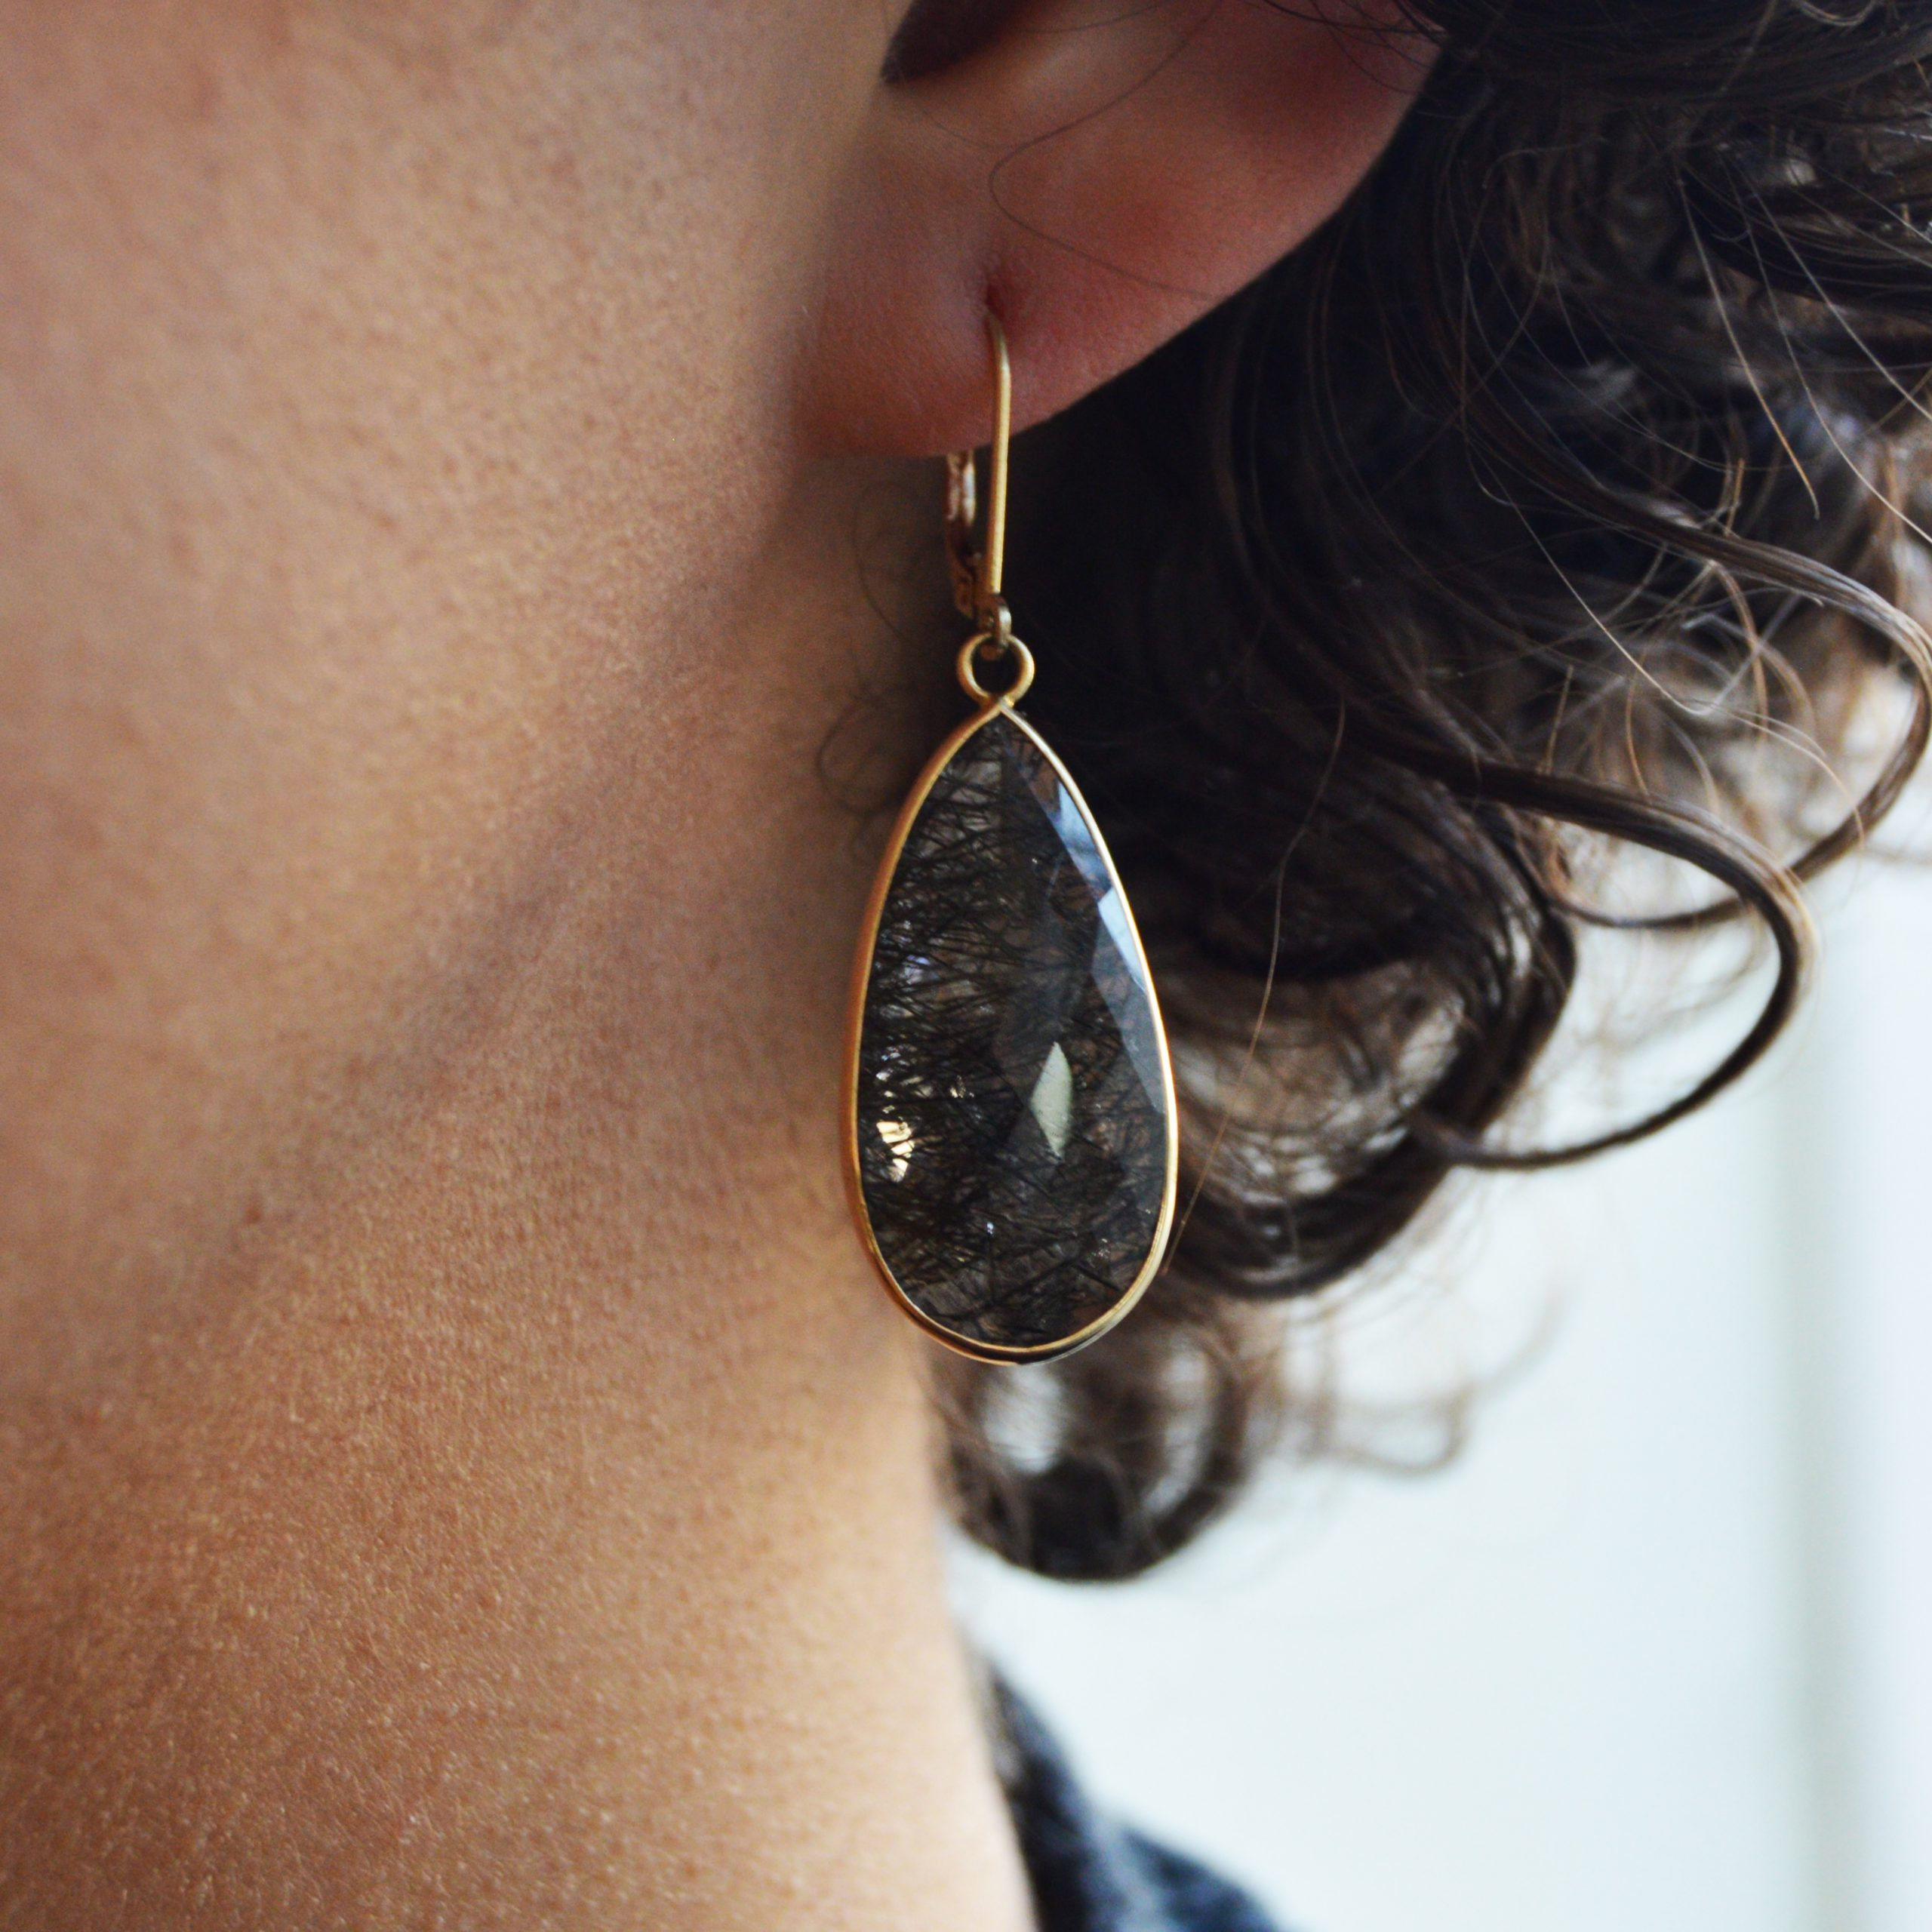 Blue Quartz Dangle Earrings,14K Yellow Gold Leverbacks